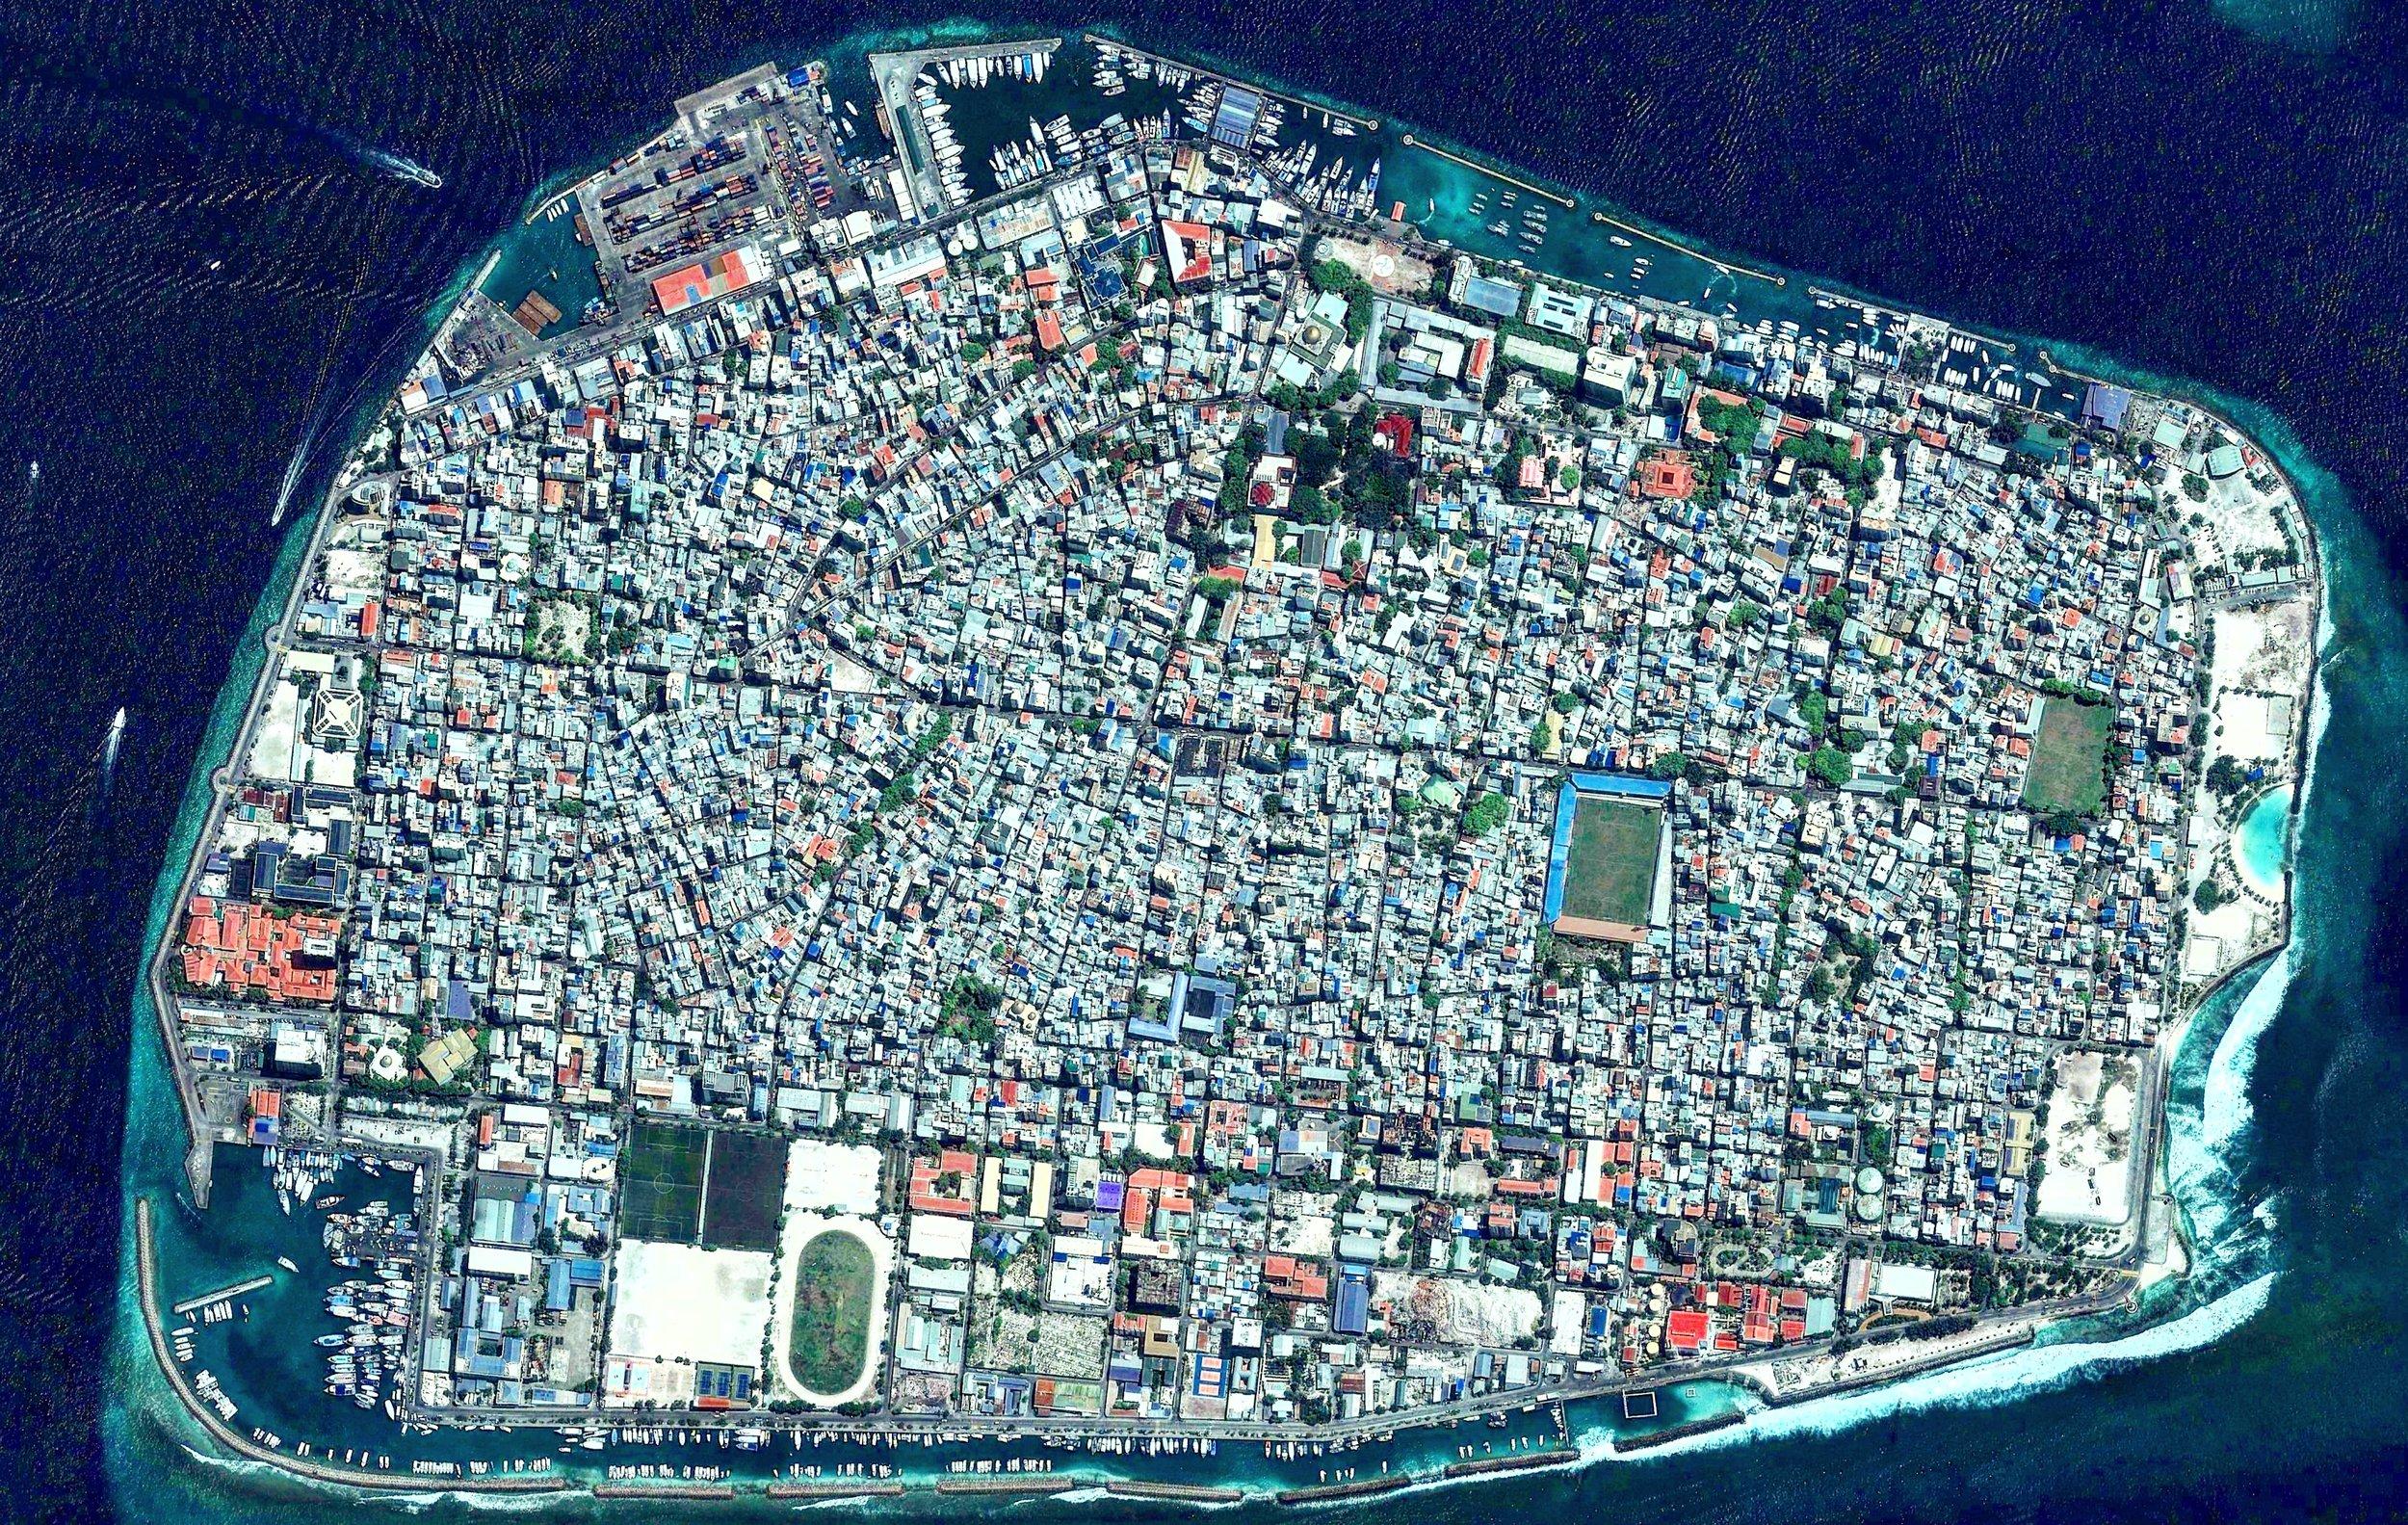 Malé, capital das Maldivas - image from www.reddit.com